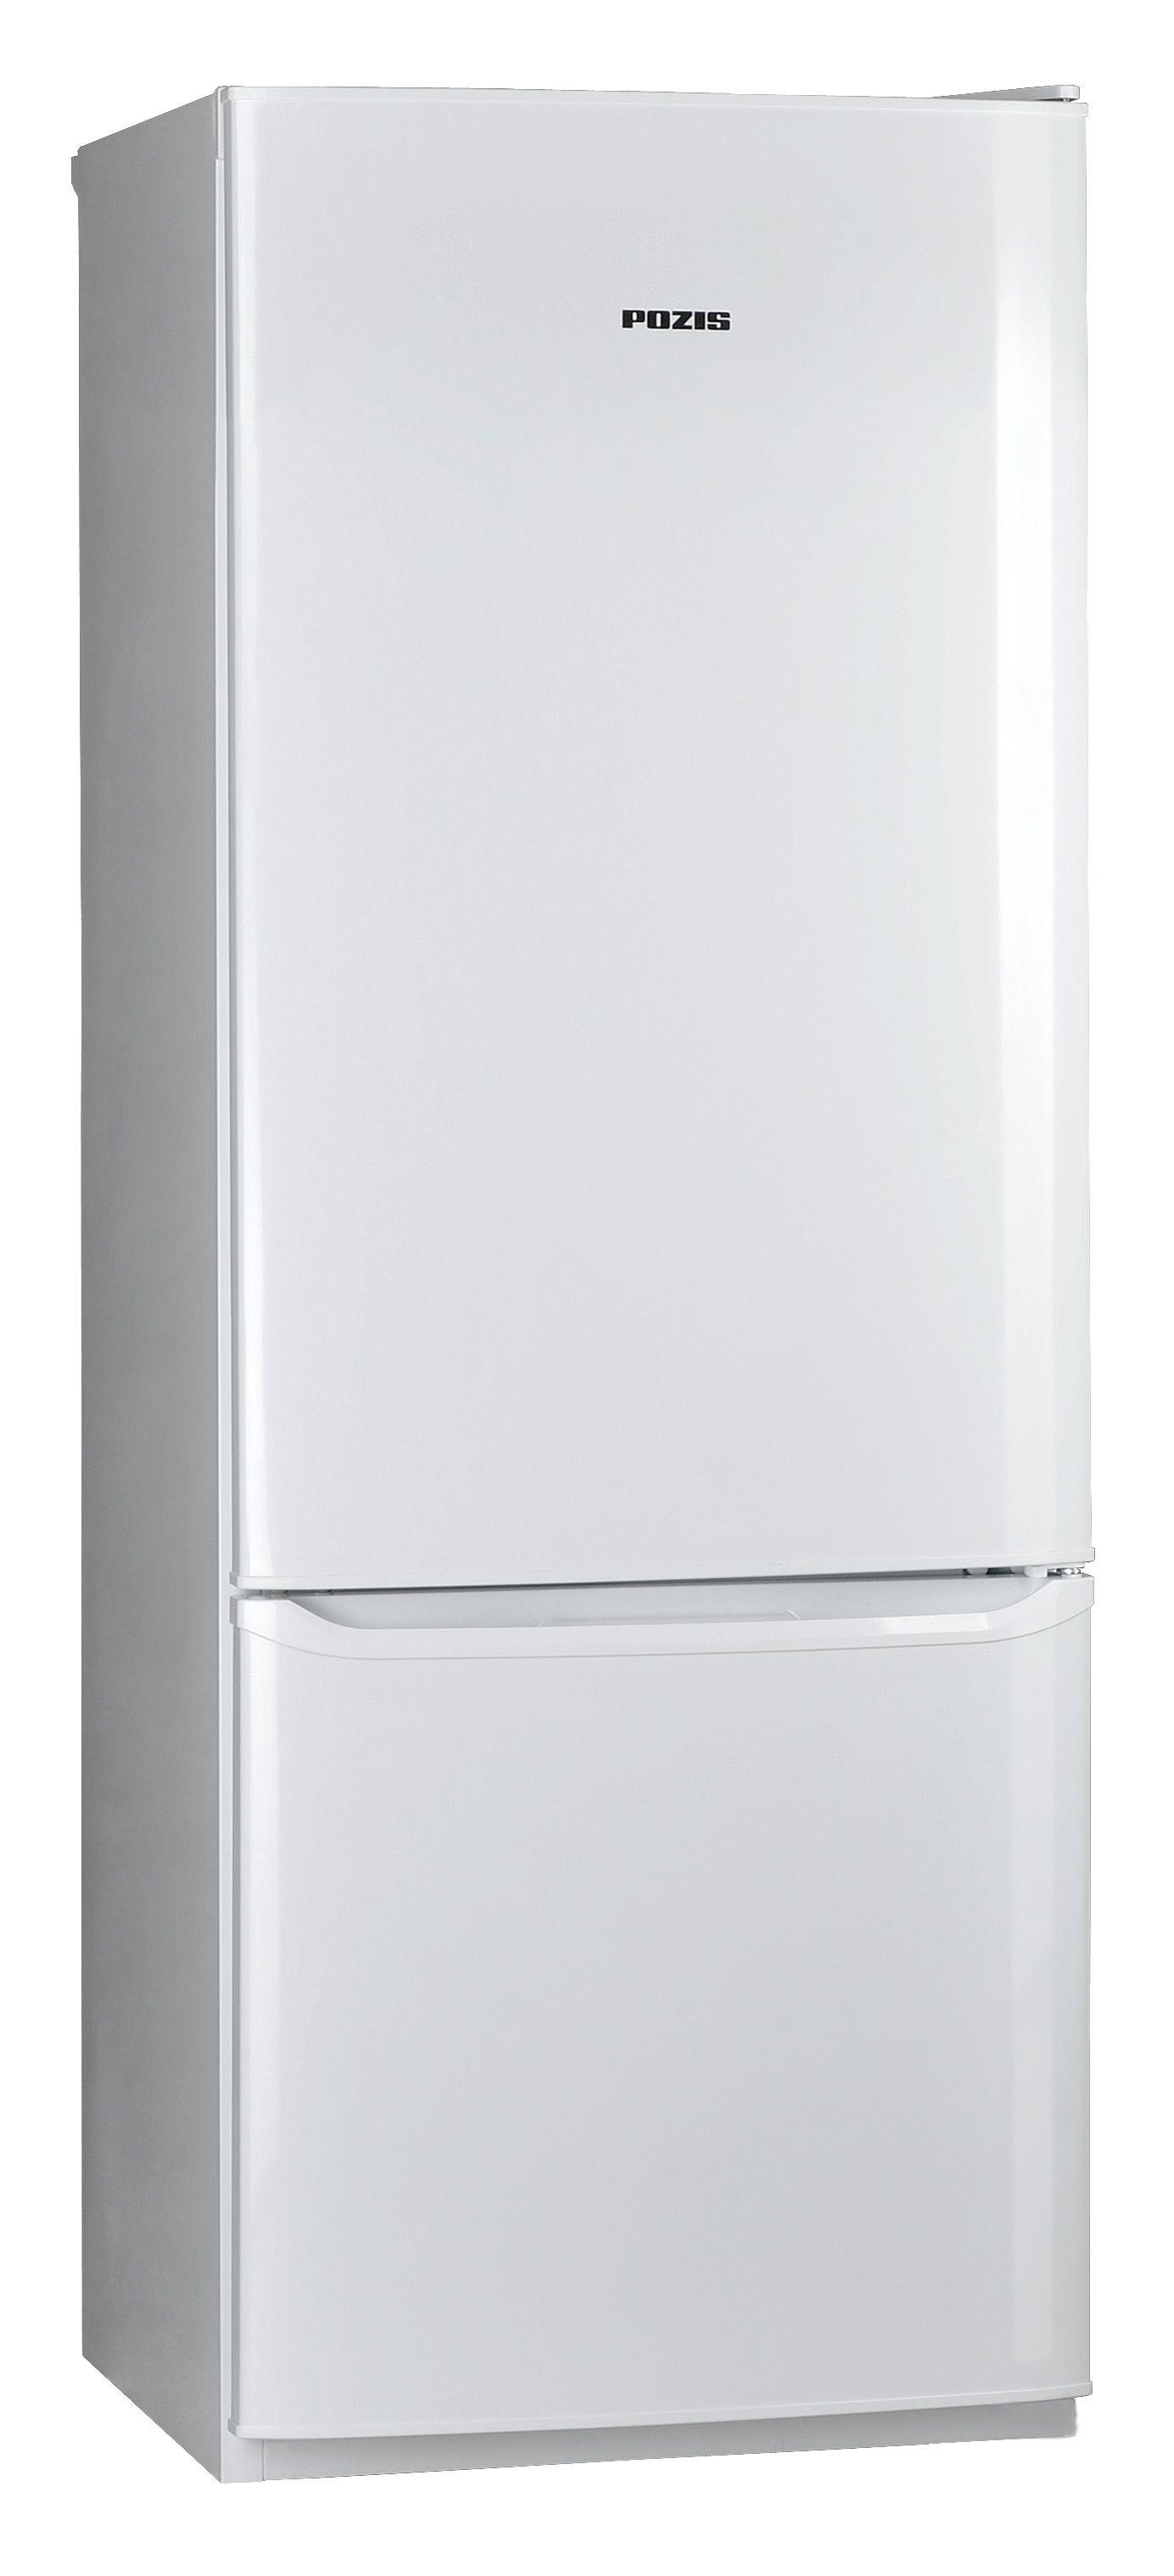 Холодильник Pozis RK-102 белыйХолодильники<br><br><br>Артикул: RK-102 А (белый)<br>Бренд: POZIS<br>Гарантия производителя: да